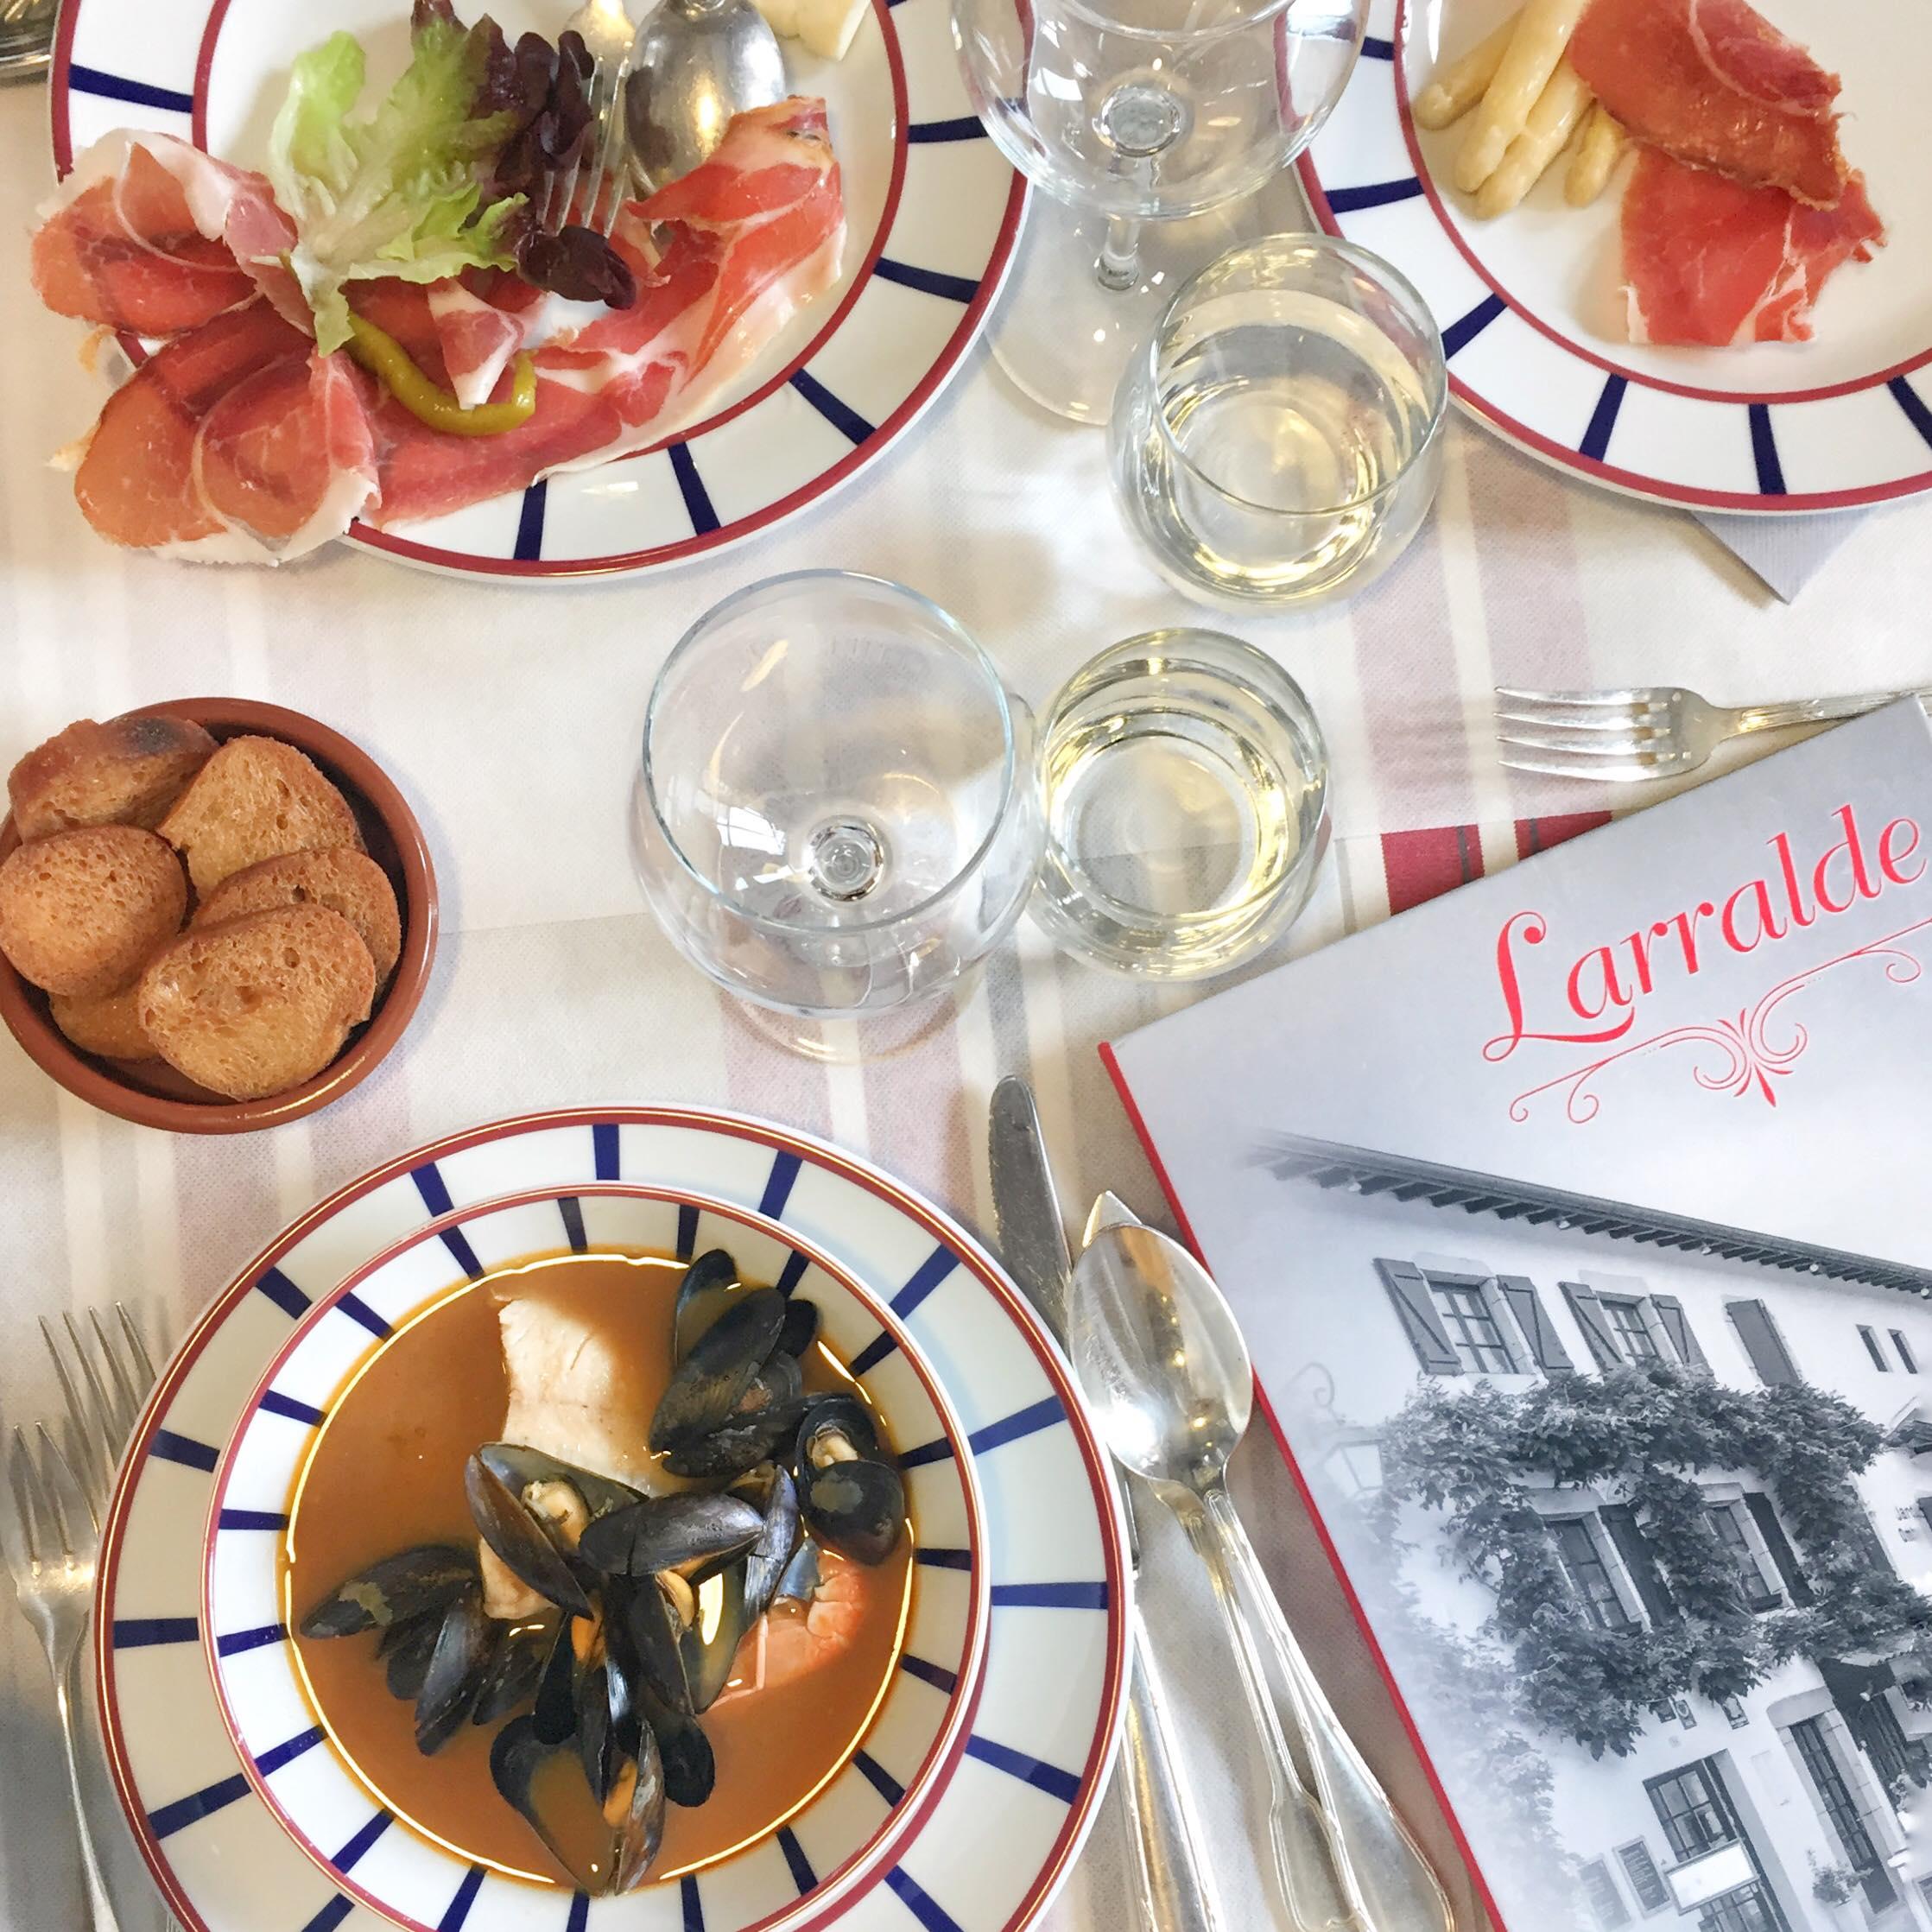 restaurant Ascain Larralde